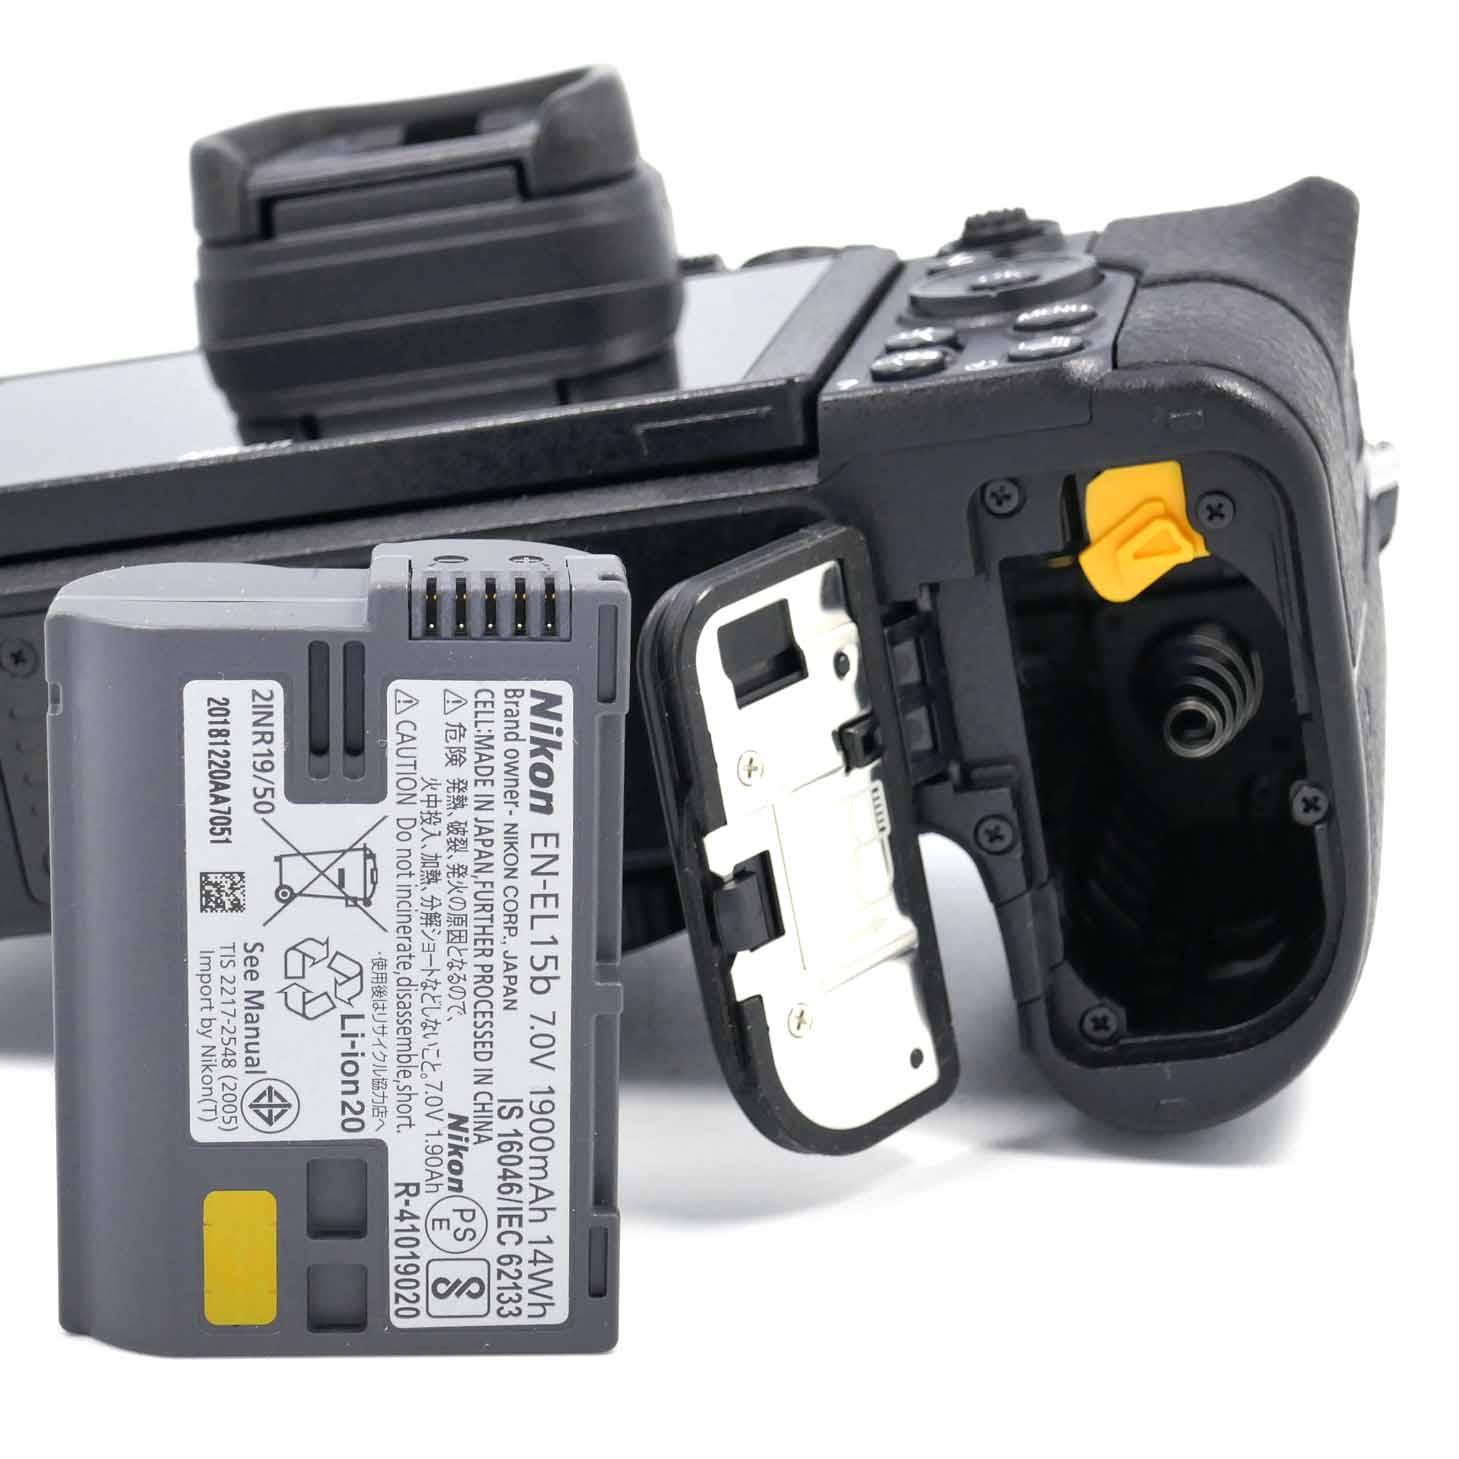 clean-cameras-Nikon-Z6-Kit-24-70-FTZ-10